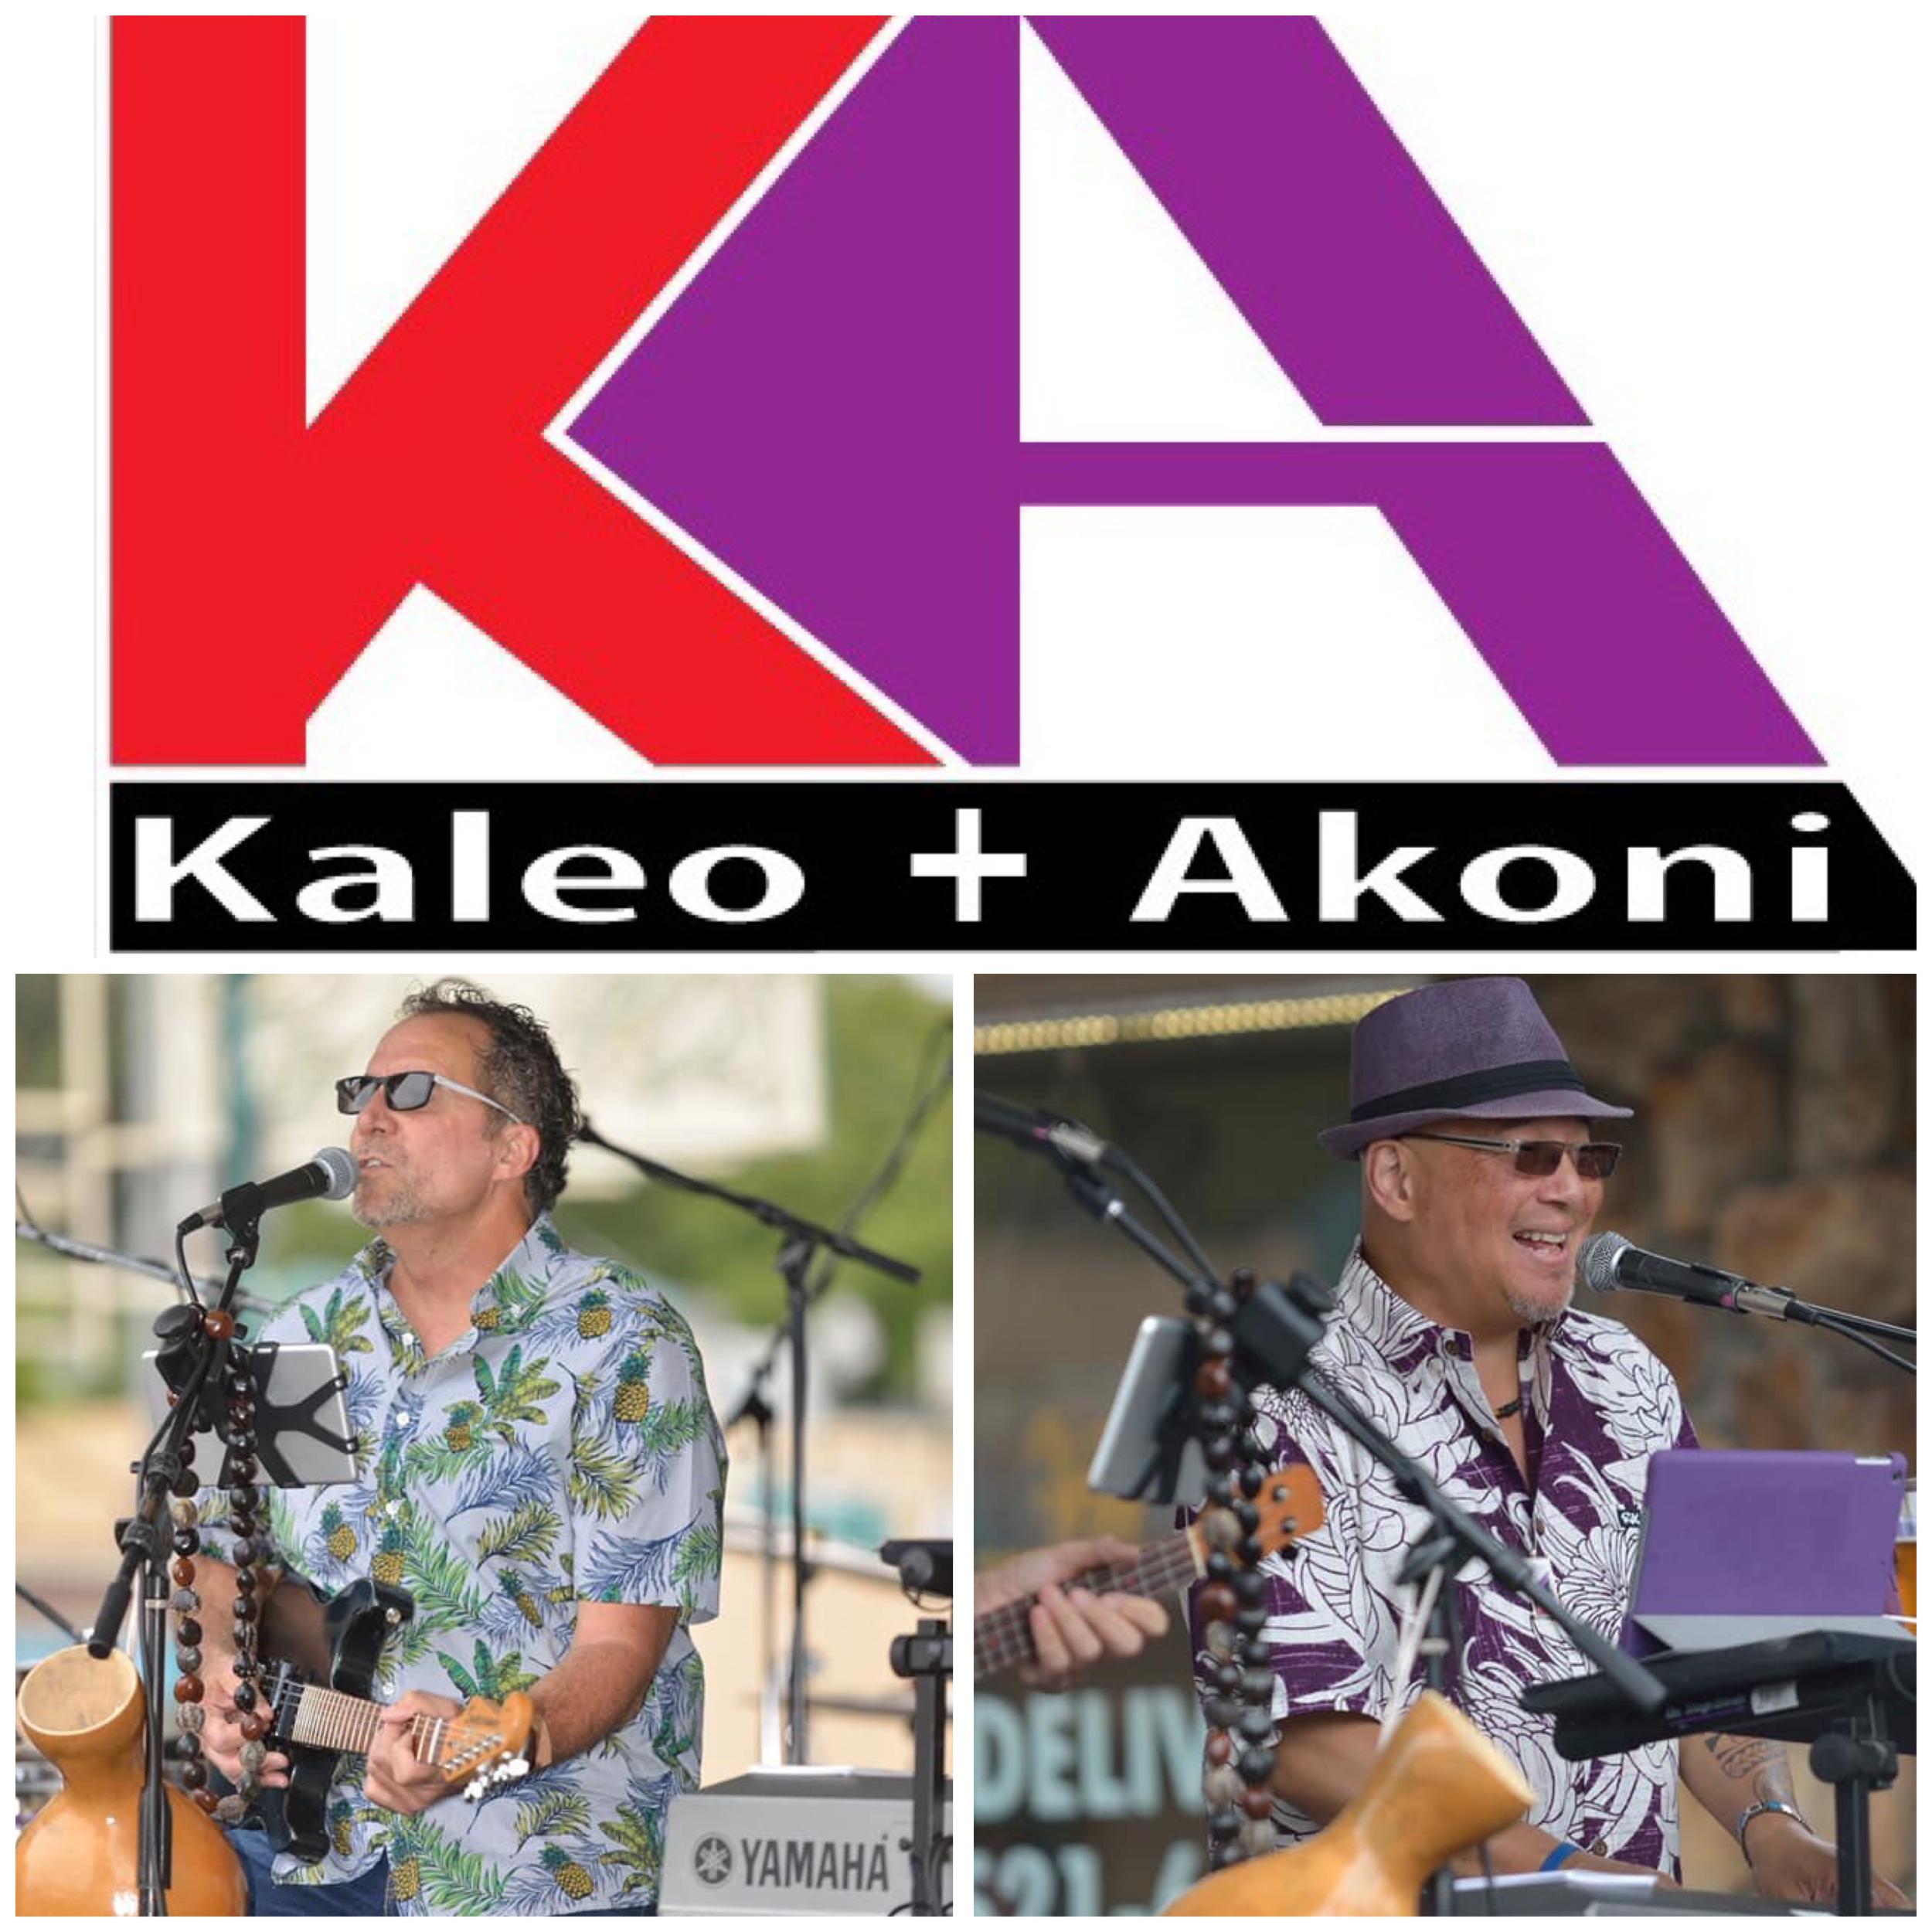 Kaleo + Akoni